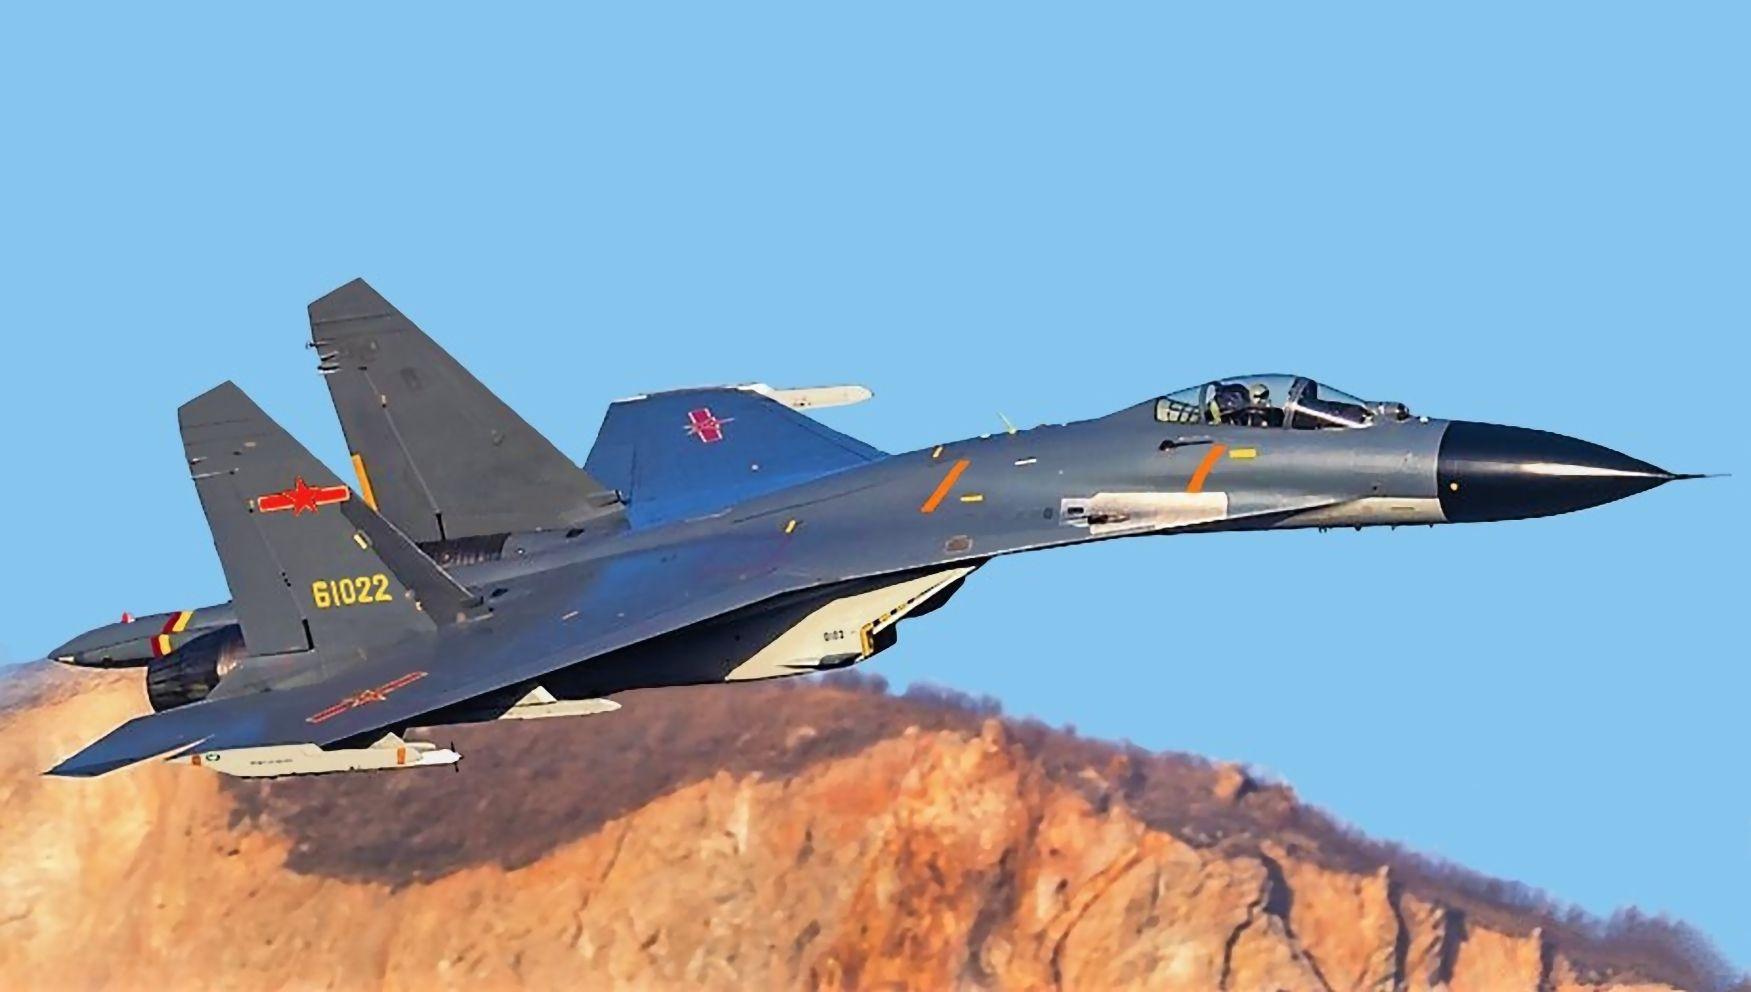 Pin de Peter Payne em Fighting Aircraft em 2020